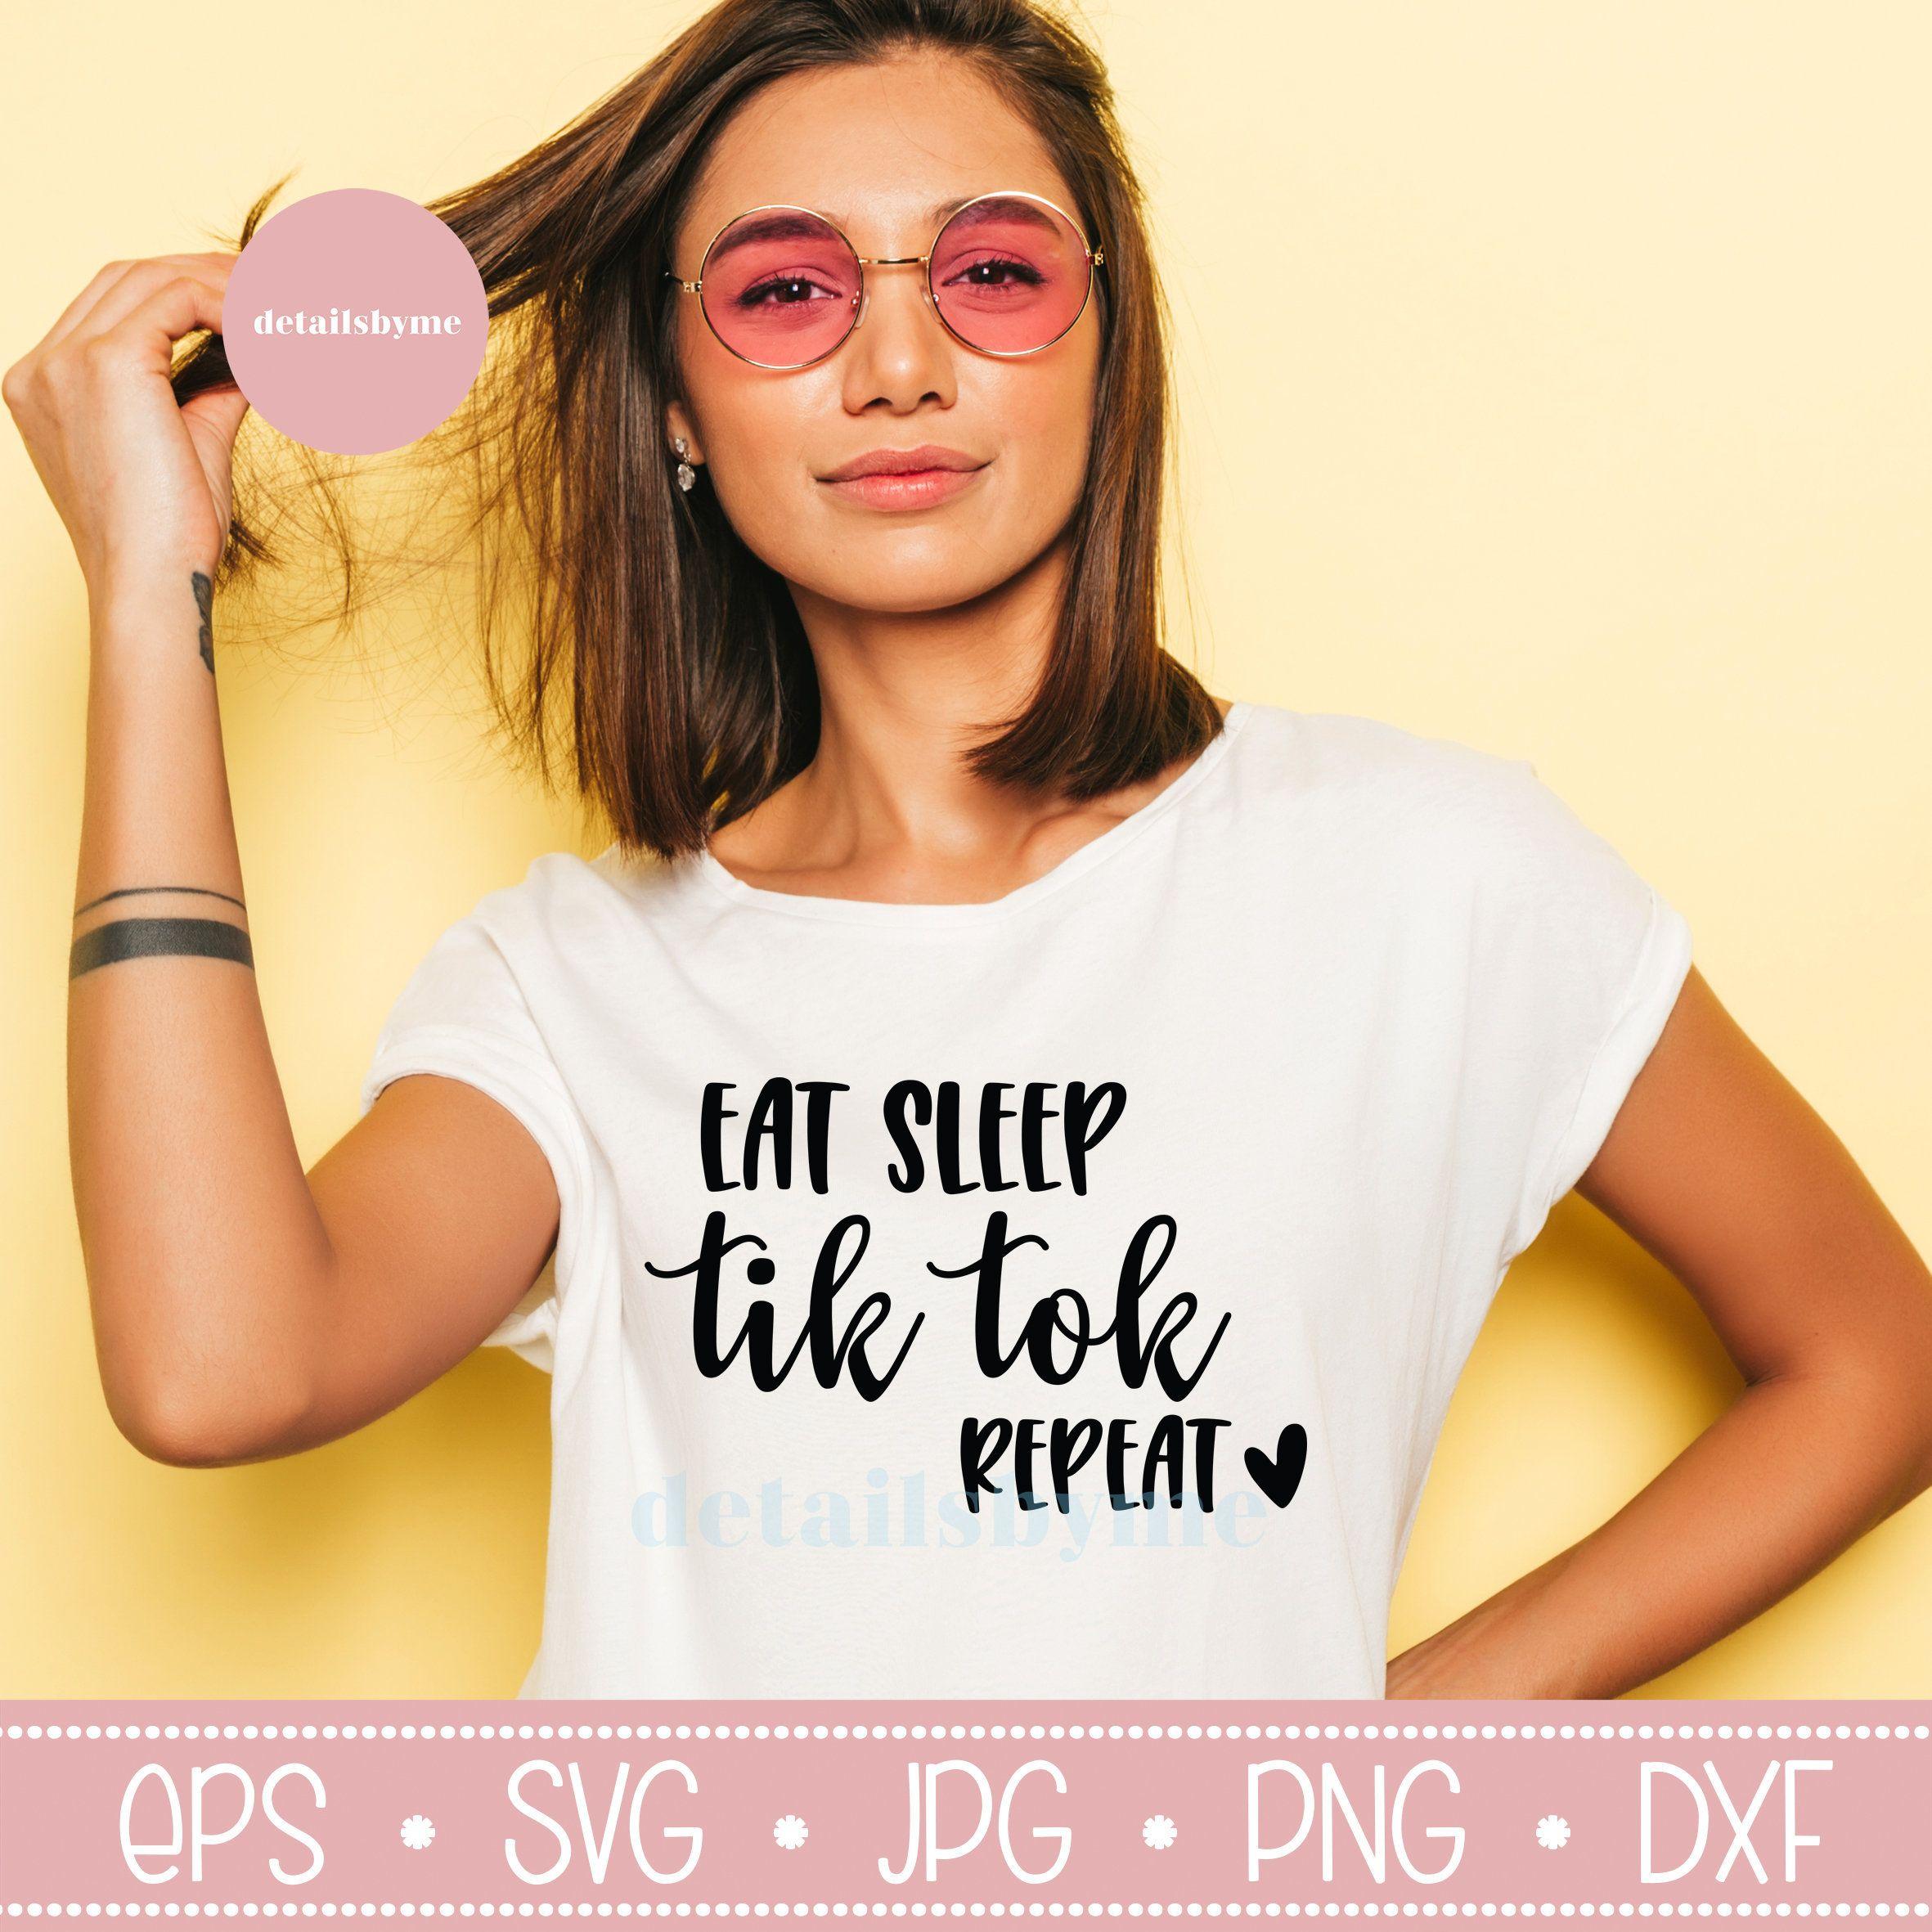 Eat Sleep Tik Tok Repeat Svg Tik tok Fans Tiktokers Svg